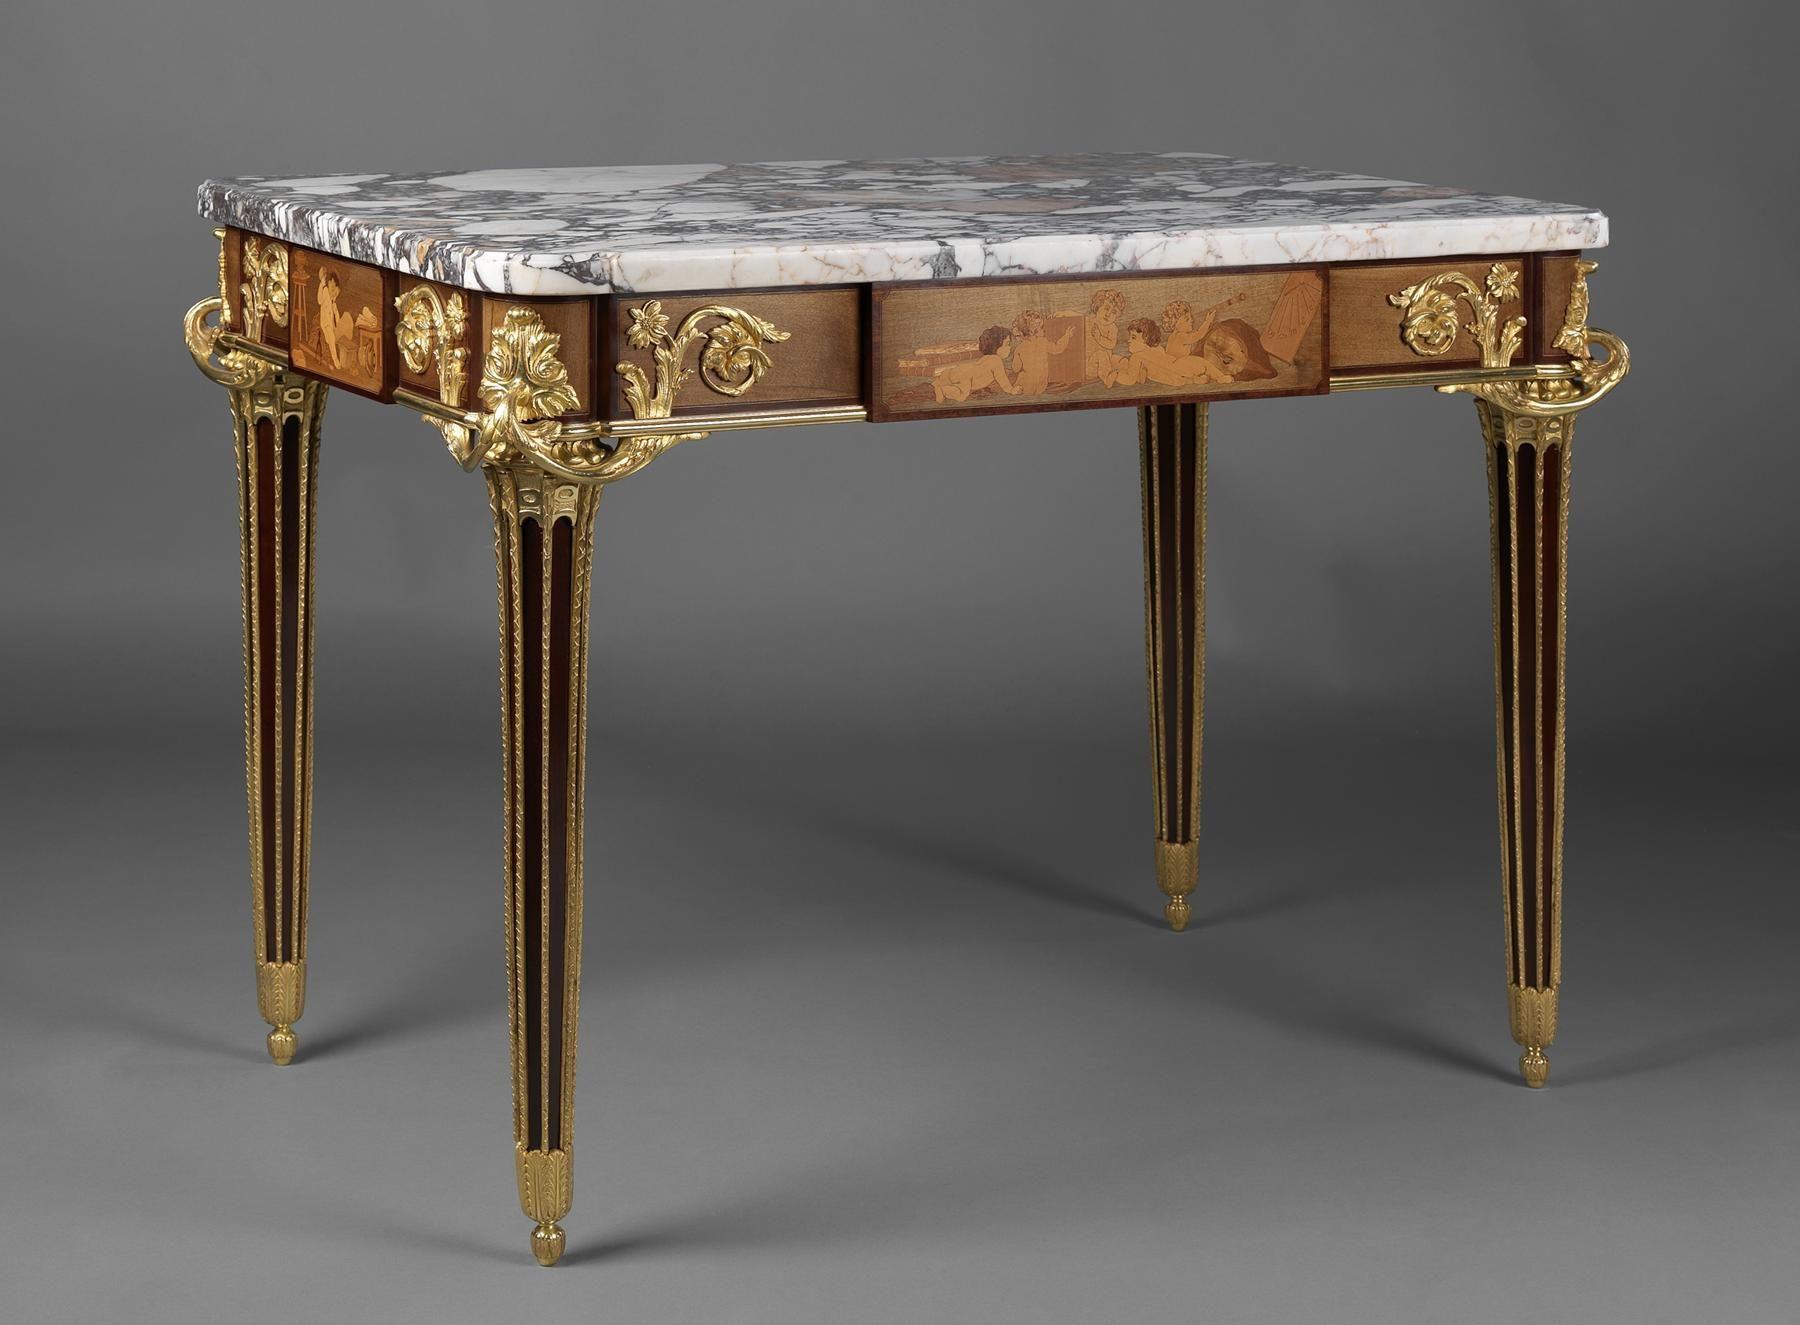 Adrian Alan On Masterart Com Classic Furniture Louis Xvi Style Antique Furniture